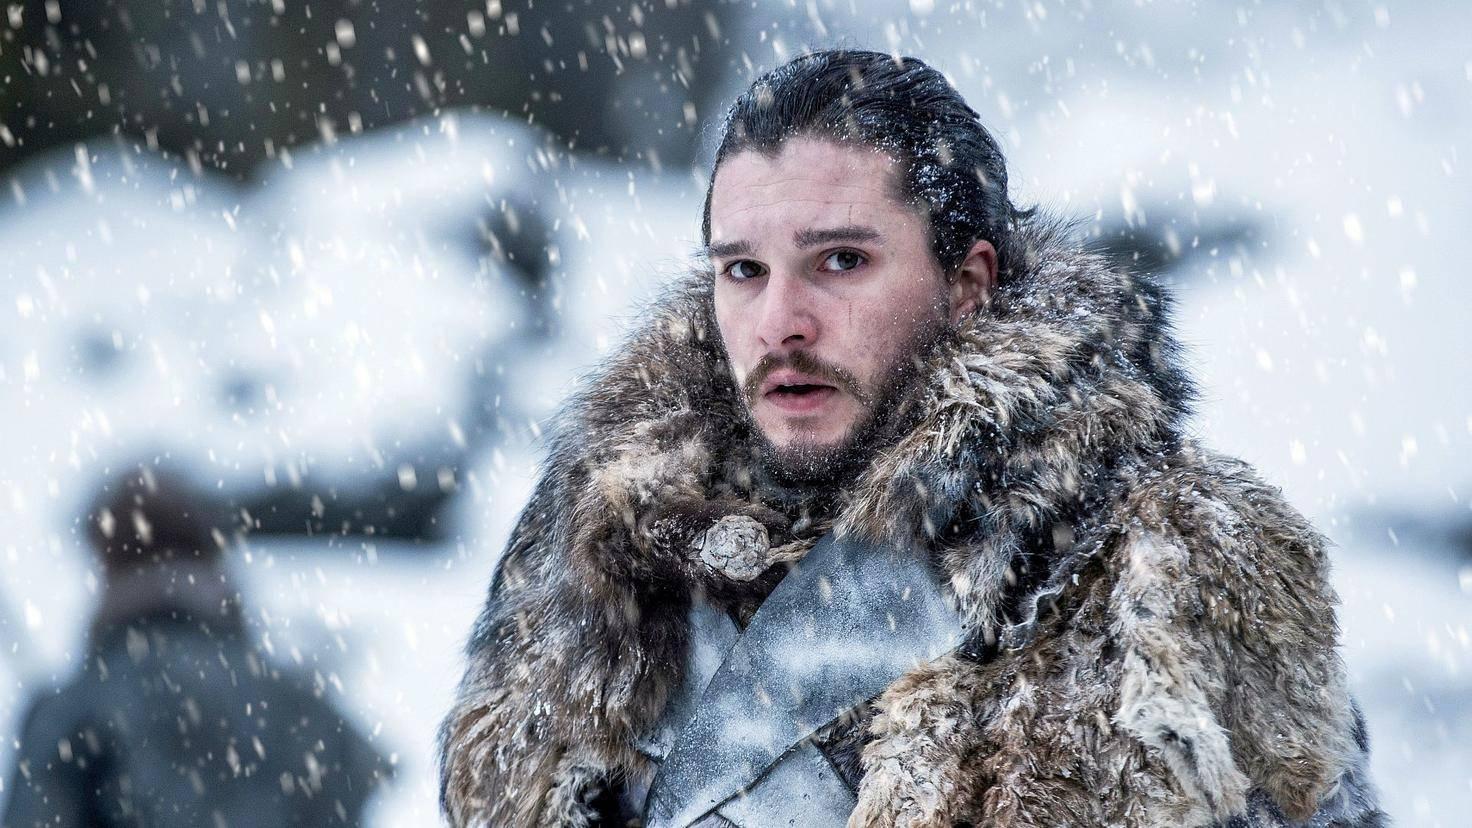 game-of-thrones-staffel-7-episode-6-jon-snow